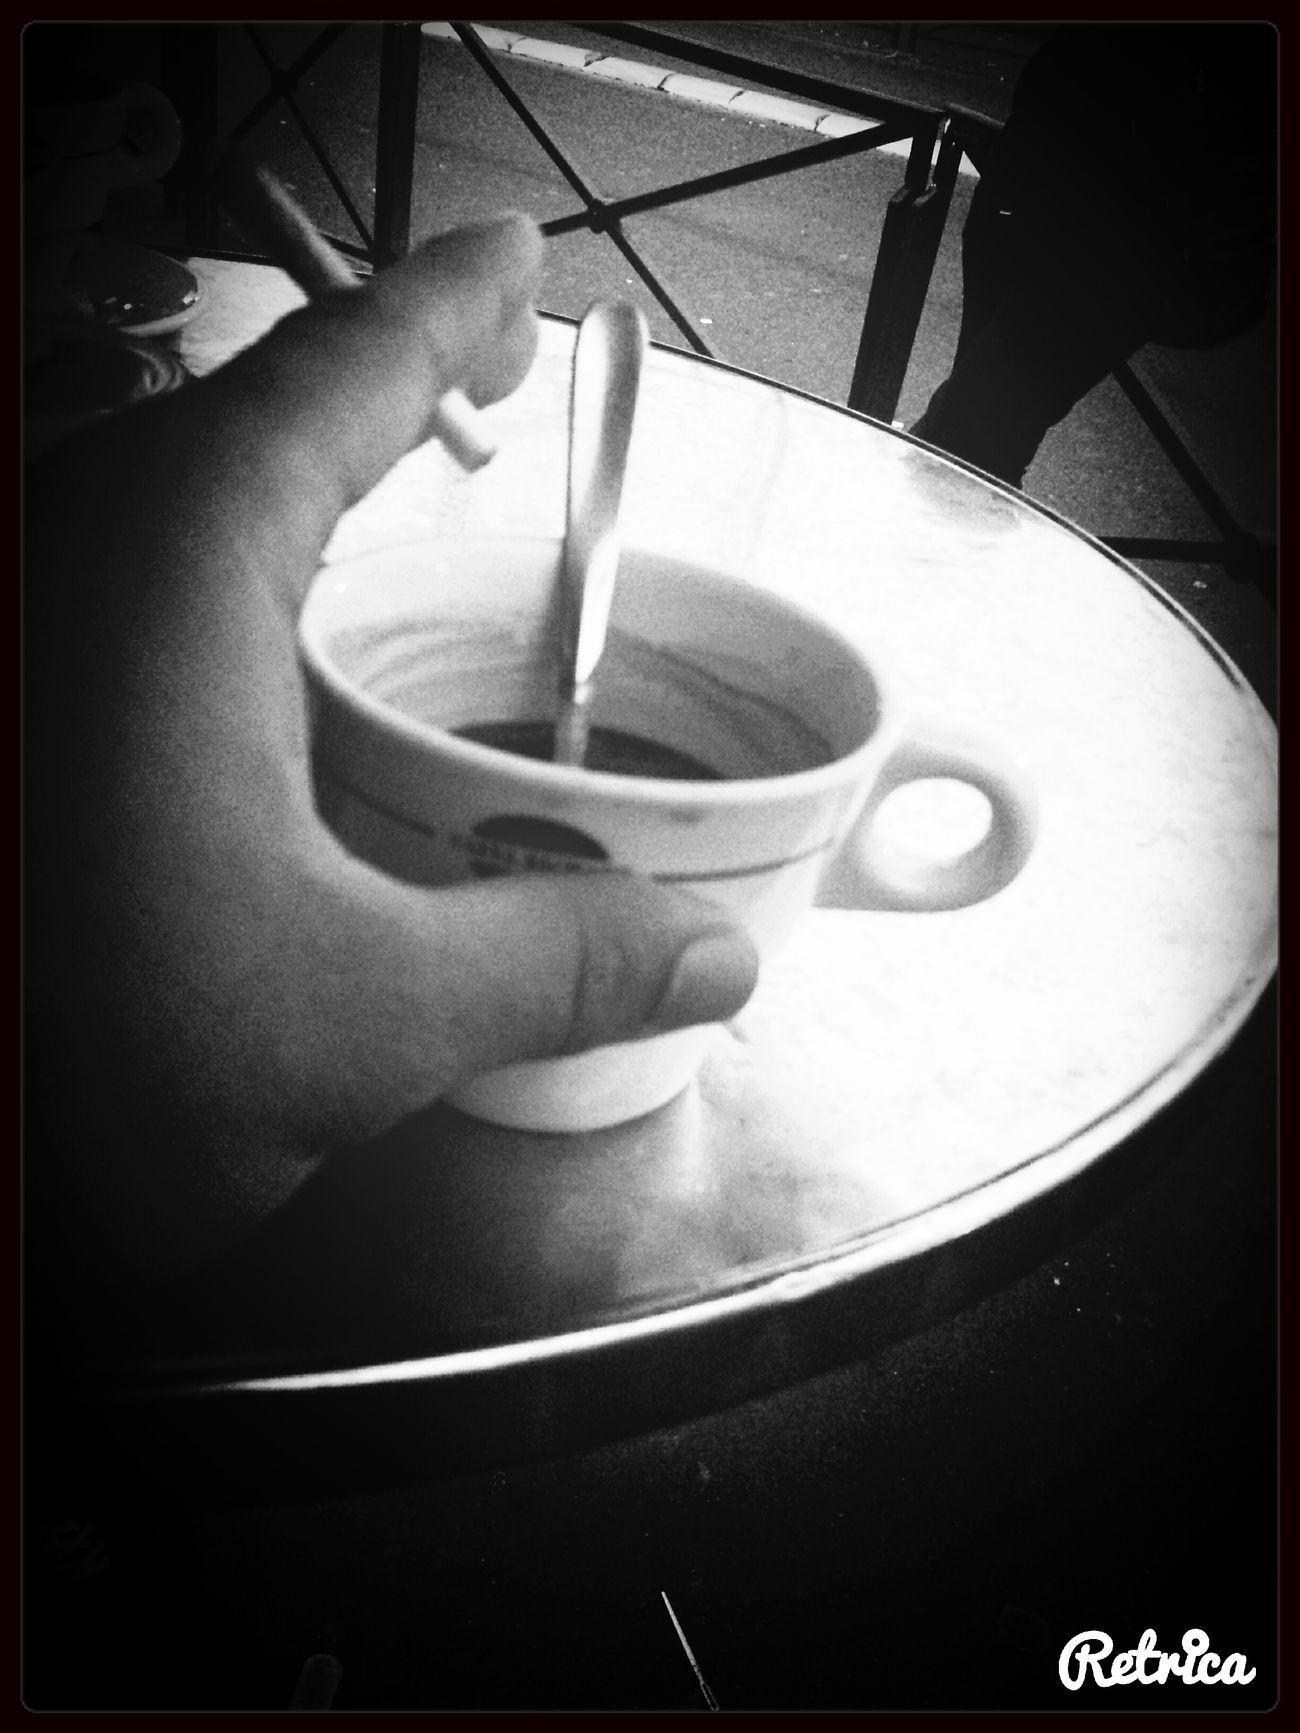 Smoke Weed Coffee And Cigarettes Today's Hot Look InTheMorning Ne Pas être Possédé Par Ce Que L'on Possède